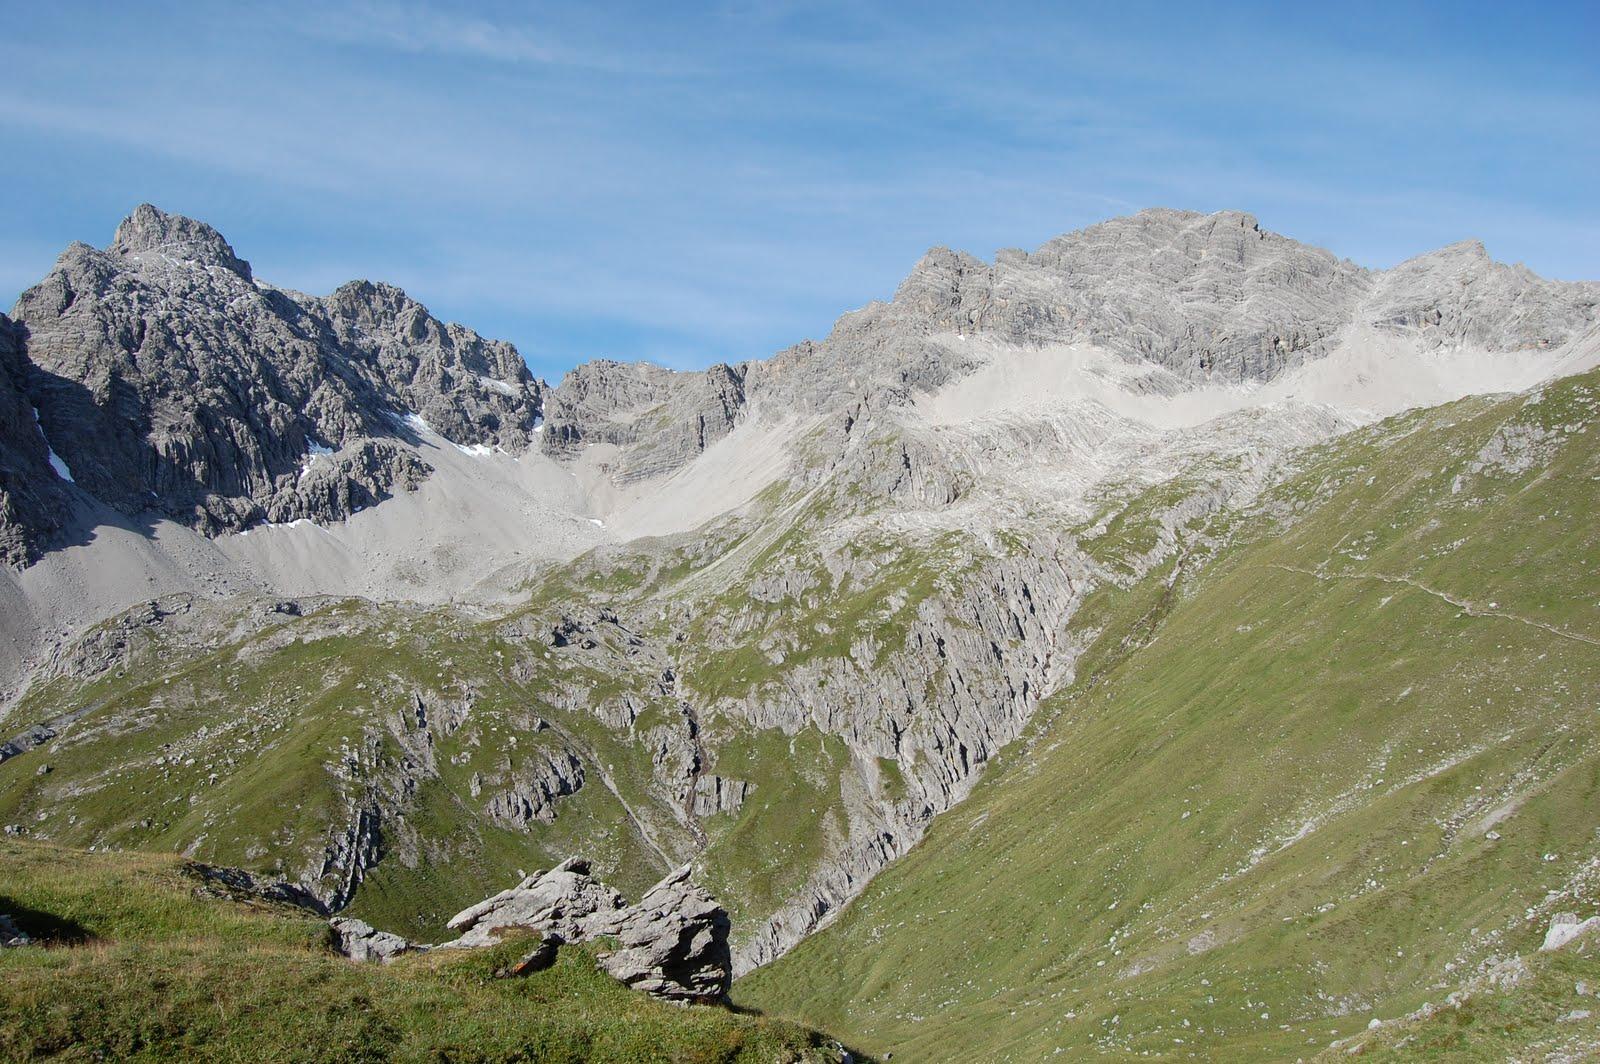 Elefanten über Alpen